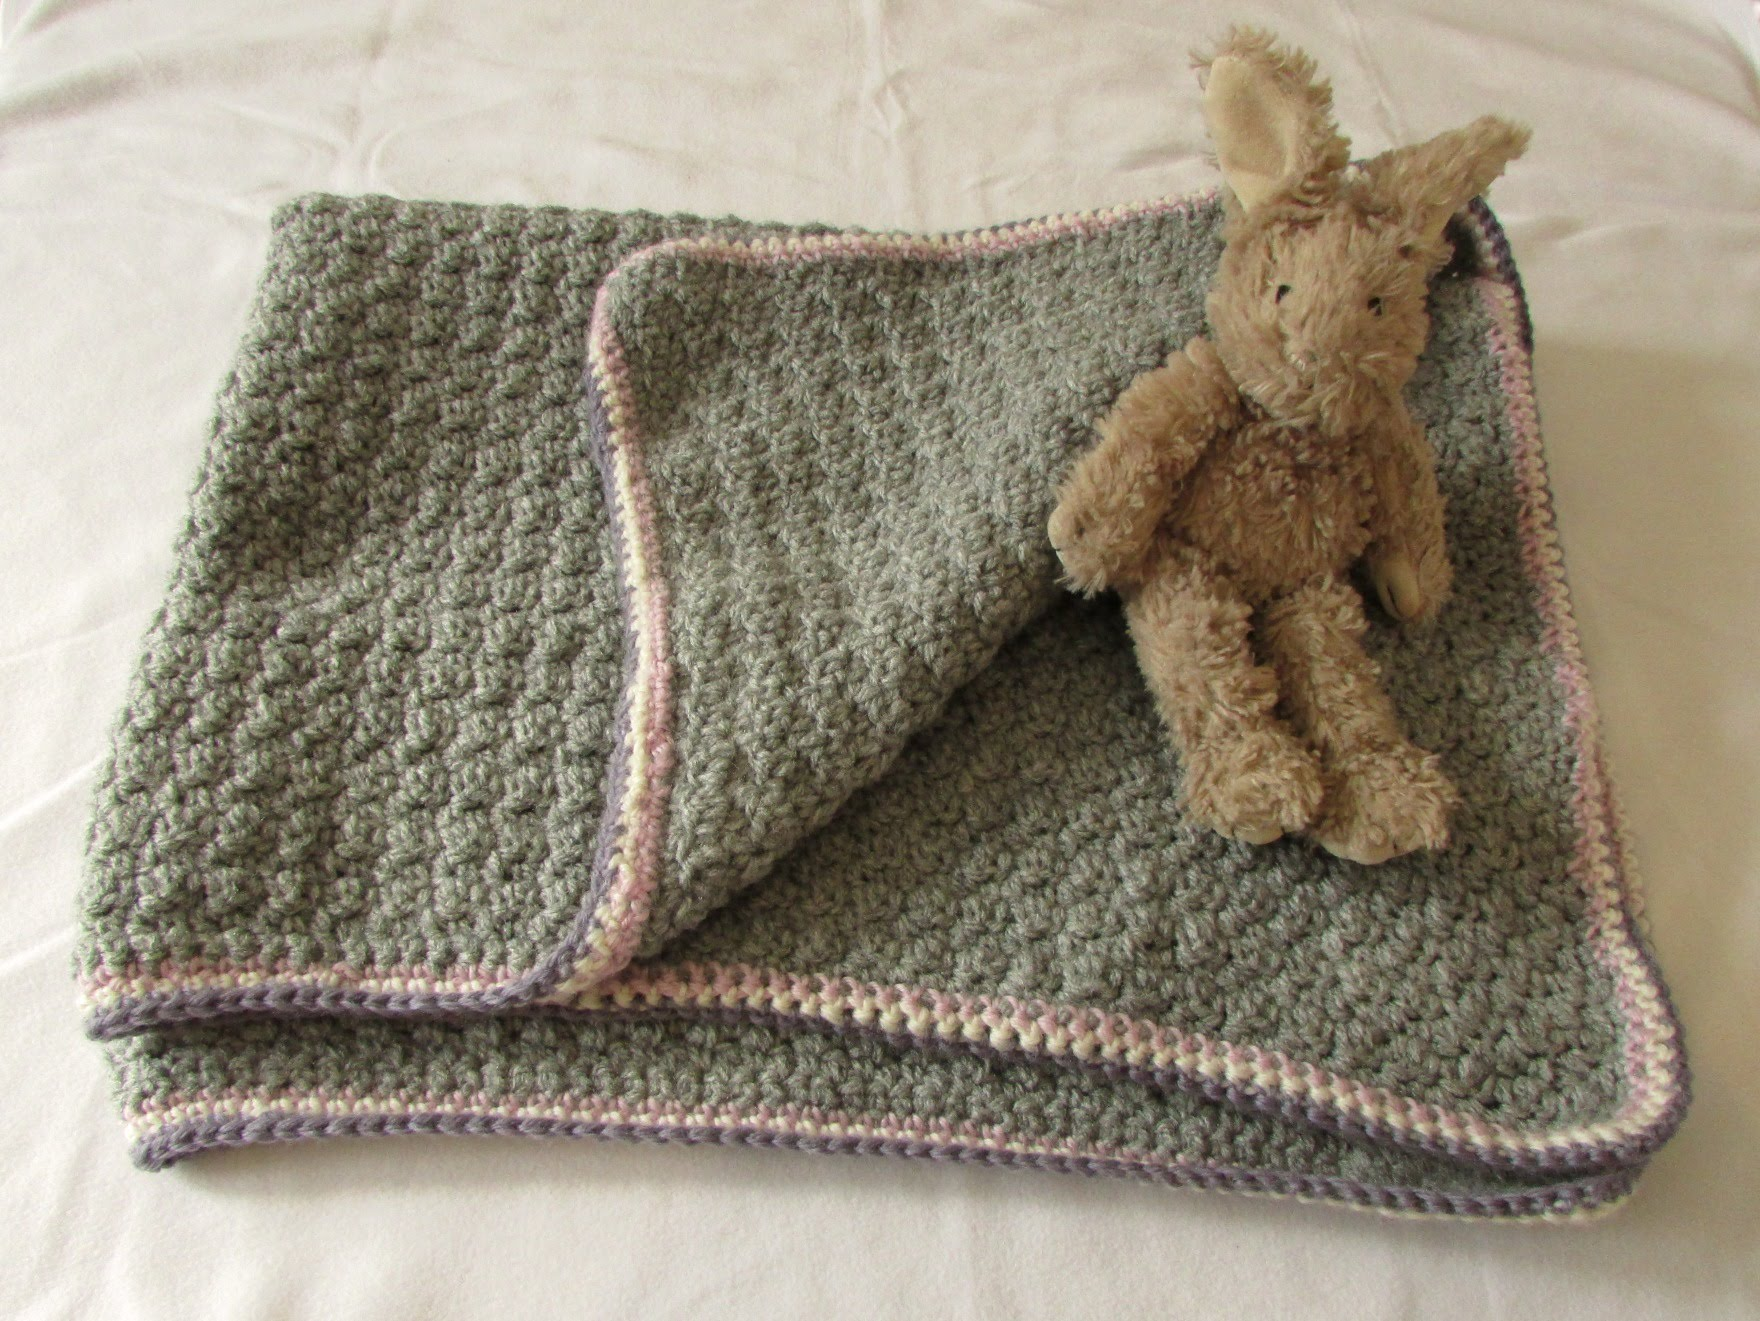 easy crochet blanket very easy crochet baby blanket for beginners - quick afghan / throw -  youtube RTANNZV